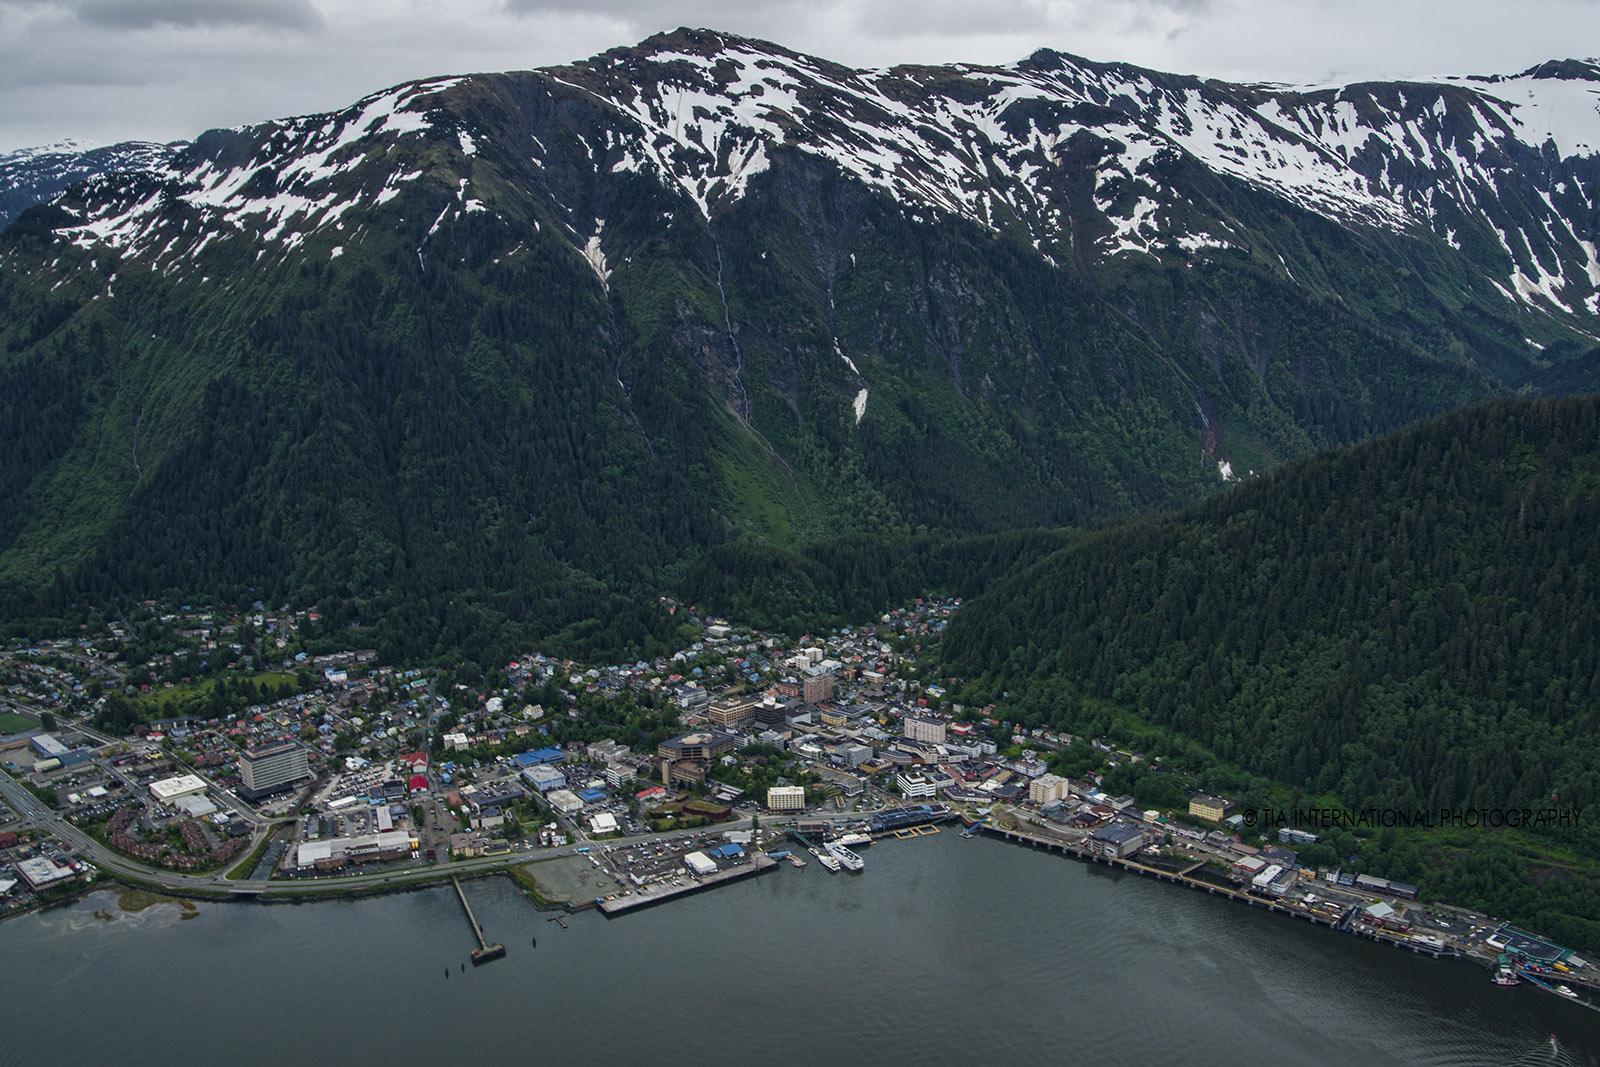 Aerial view of Juneau, Alaska.